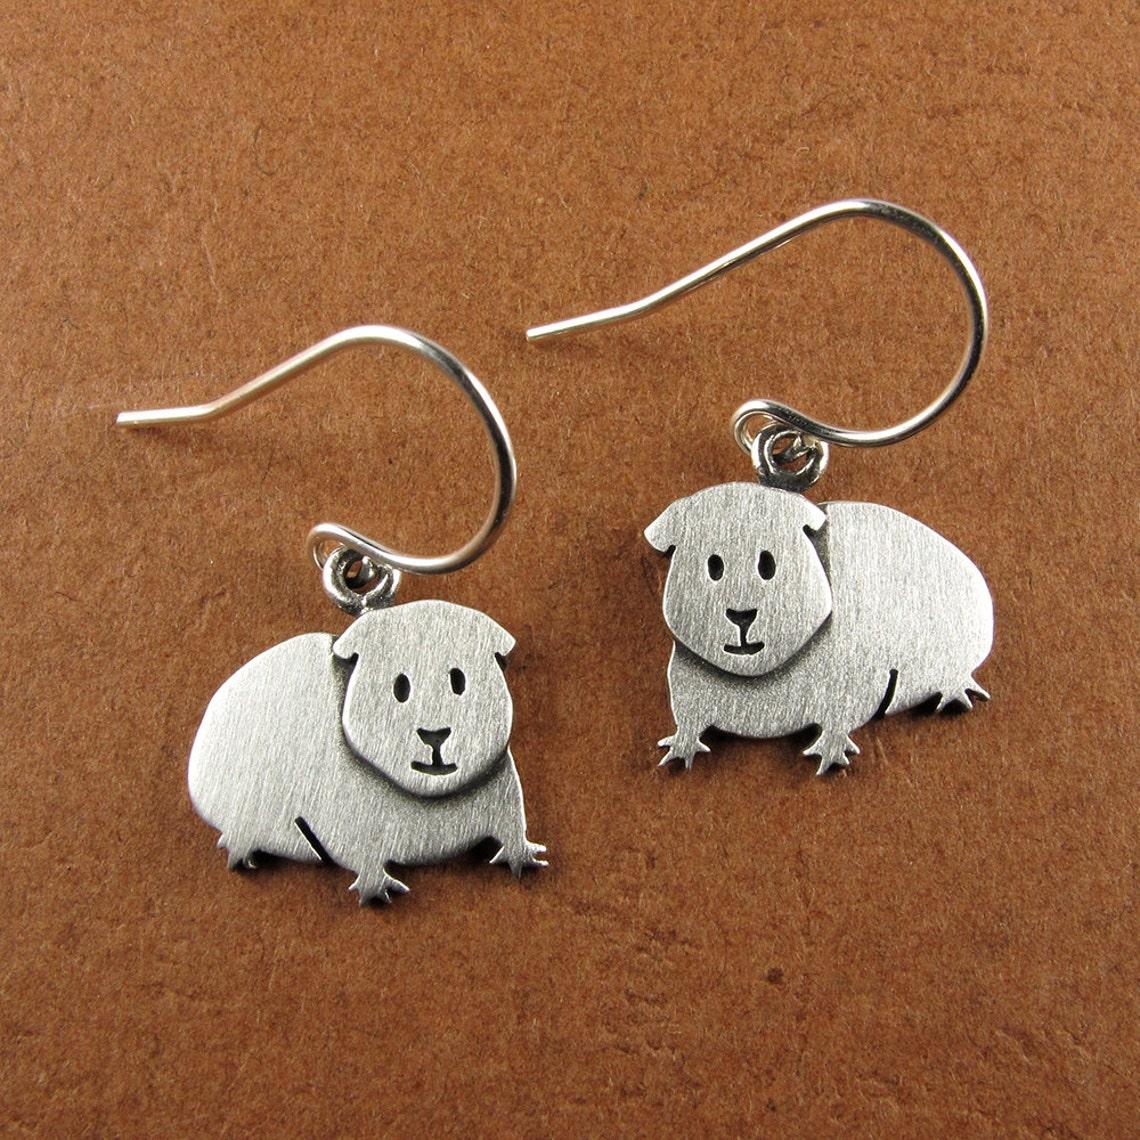 Guinea pig earrings